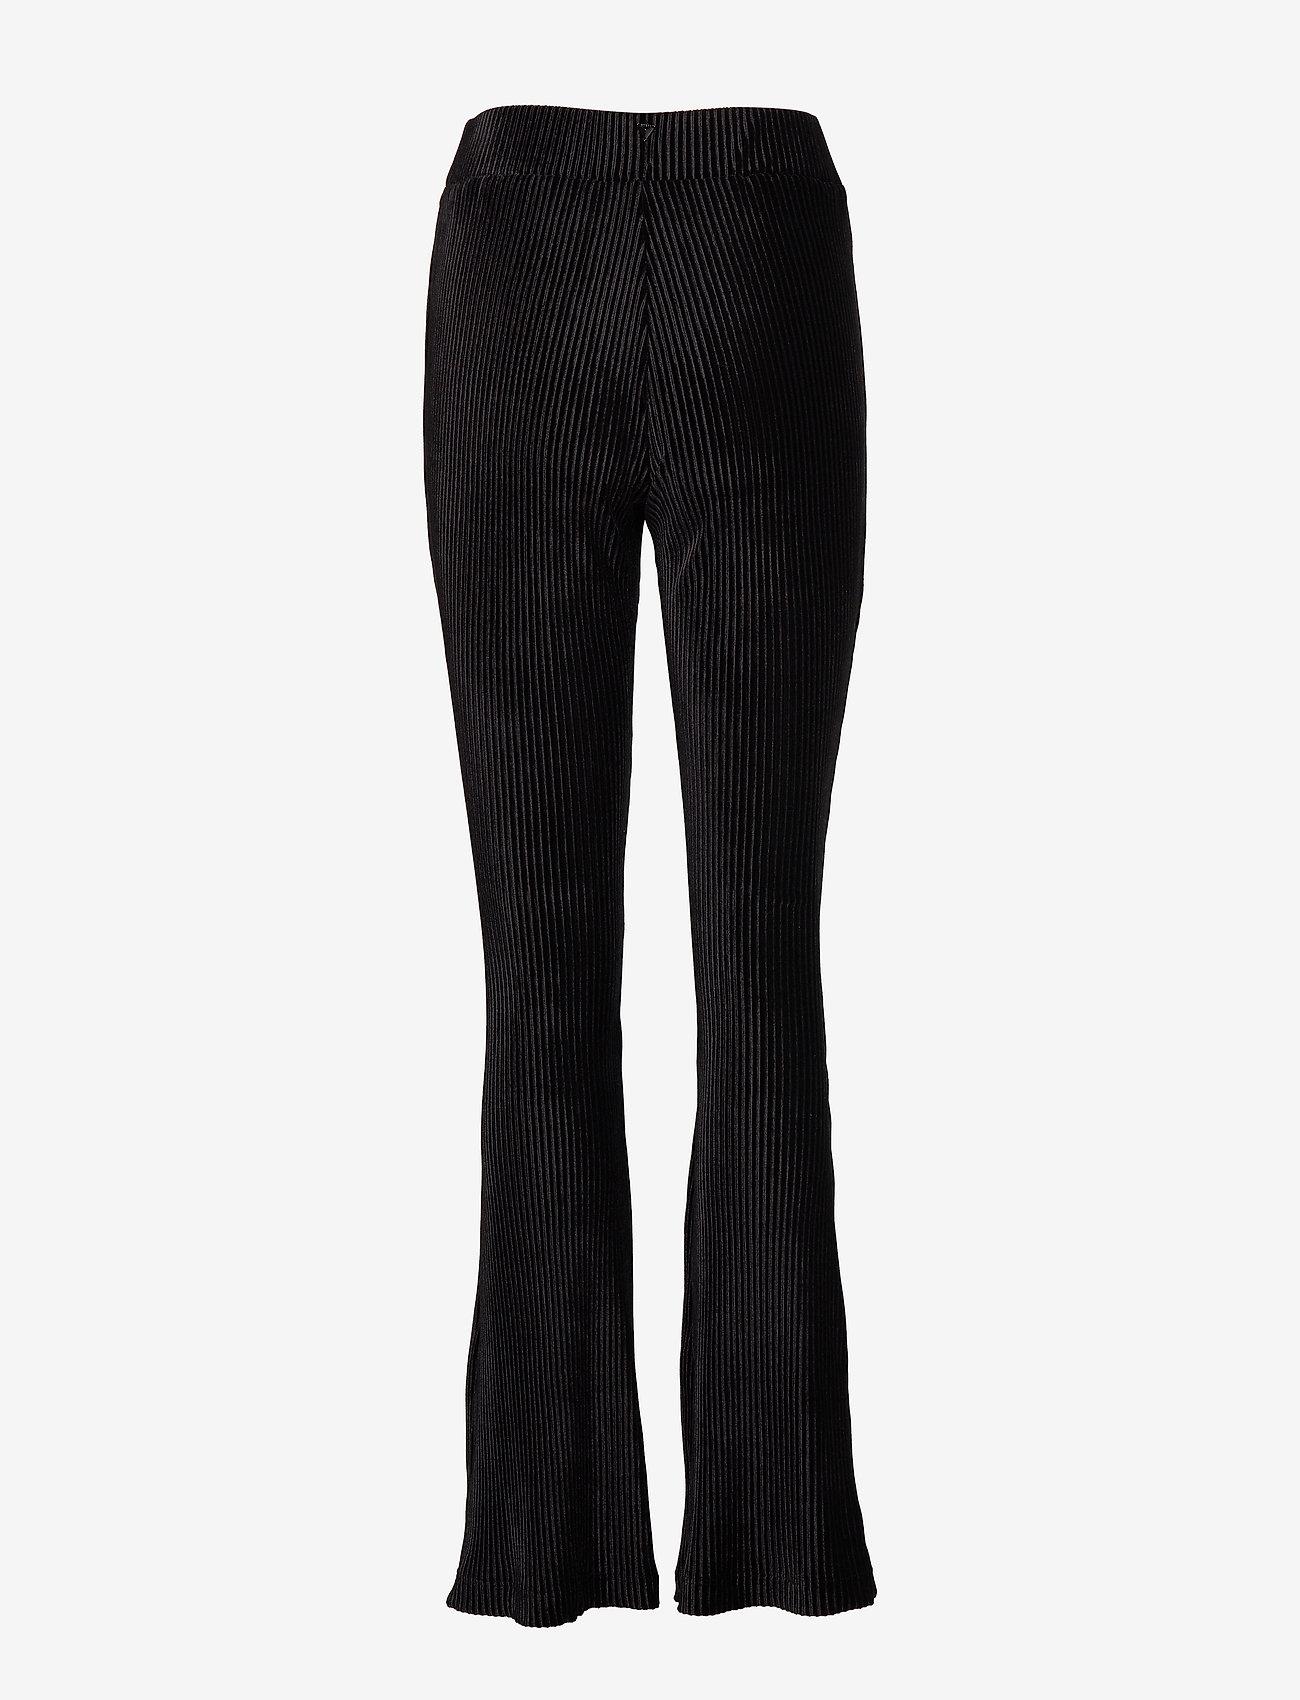 GUESS Jeans - AMBER PANTS - hosen mit weitem bein - jet black a996 - 1